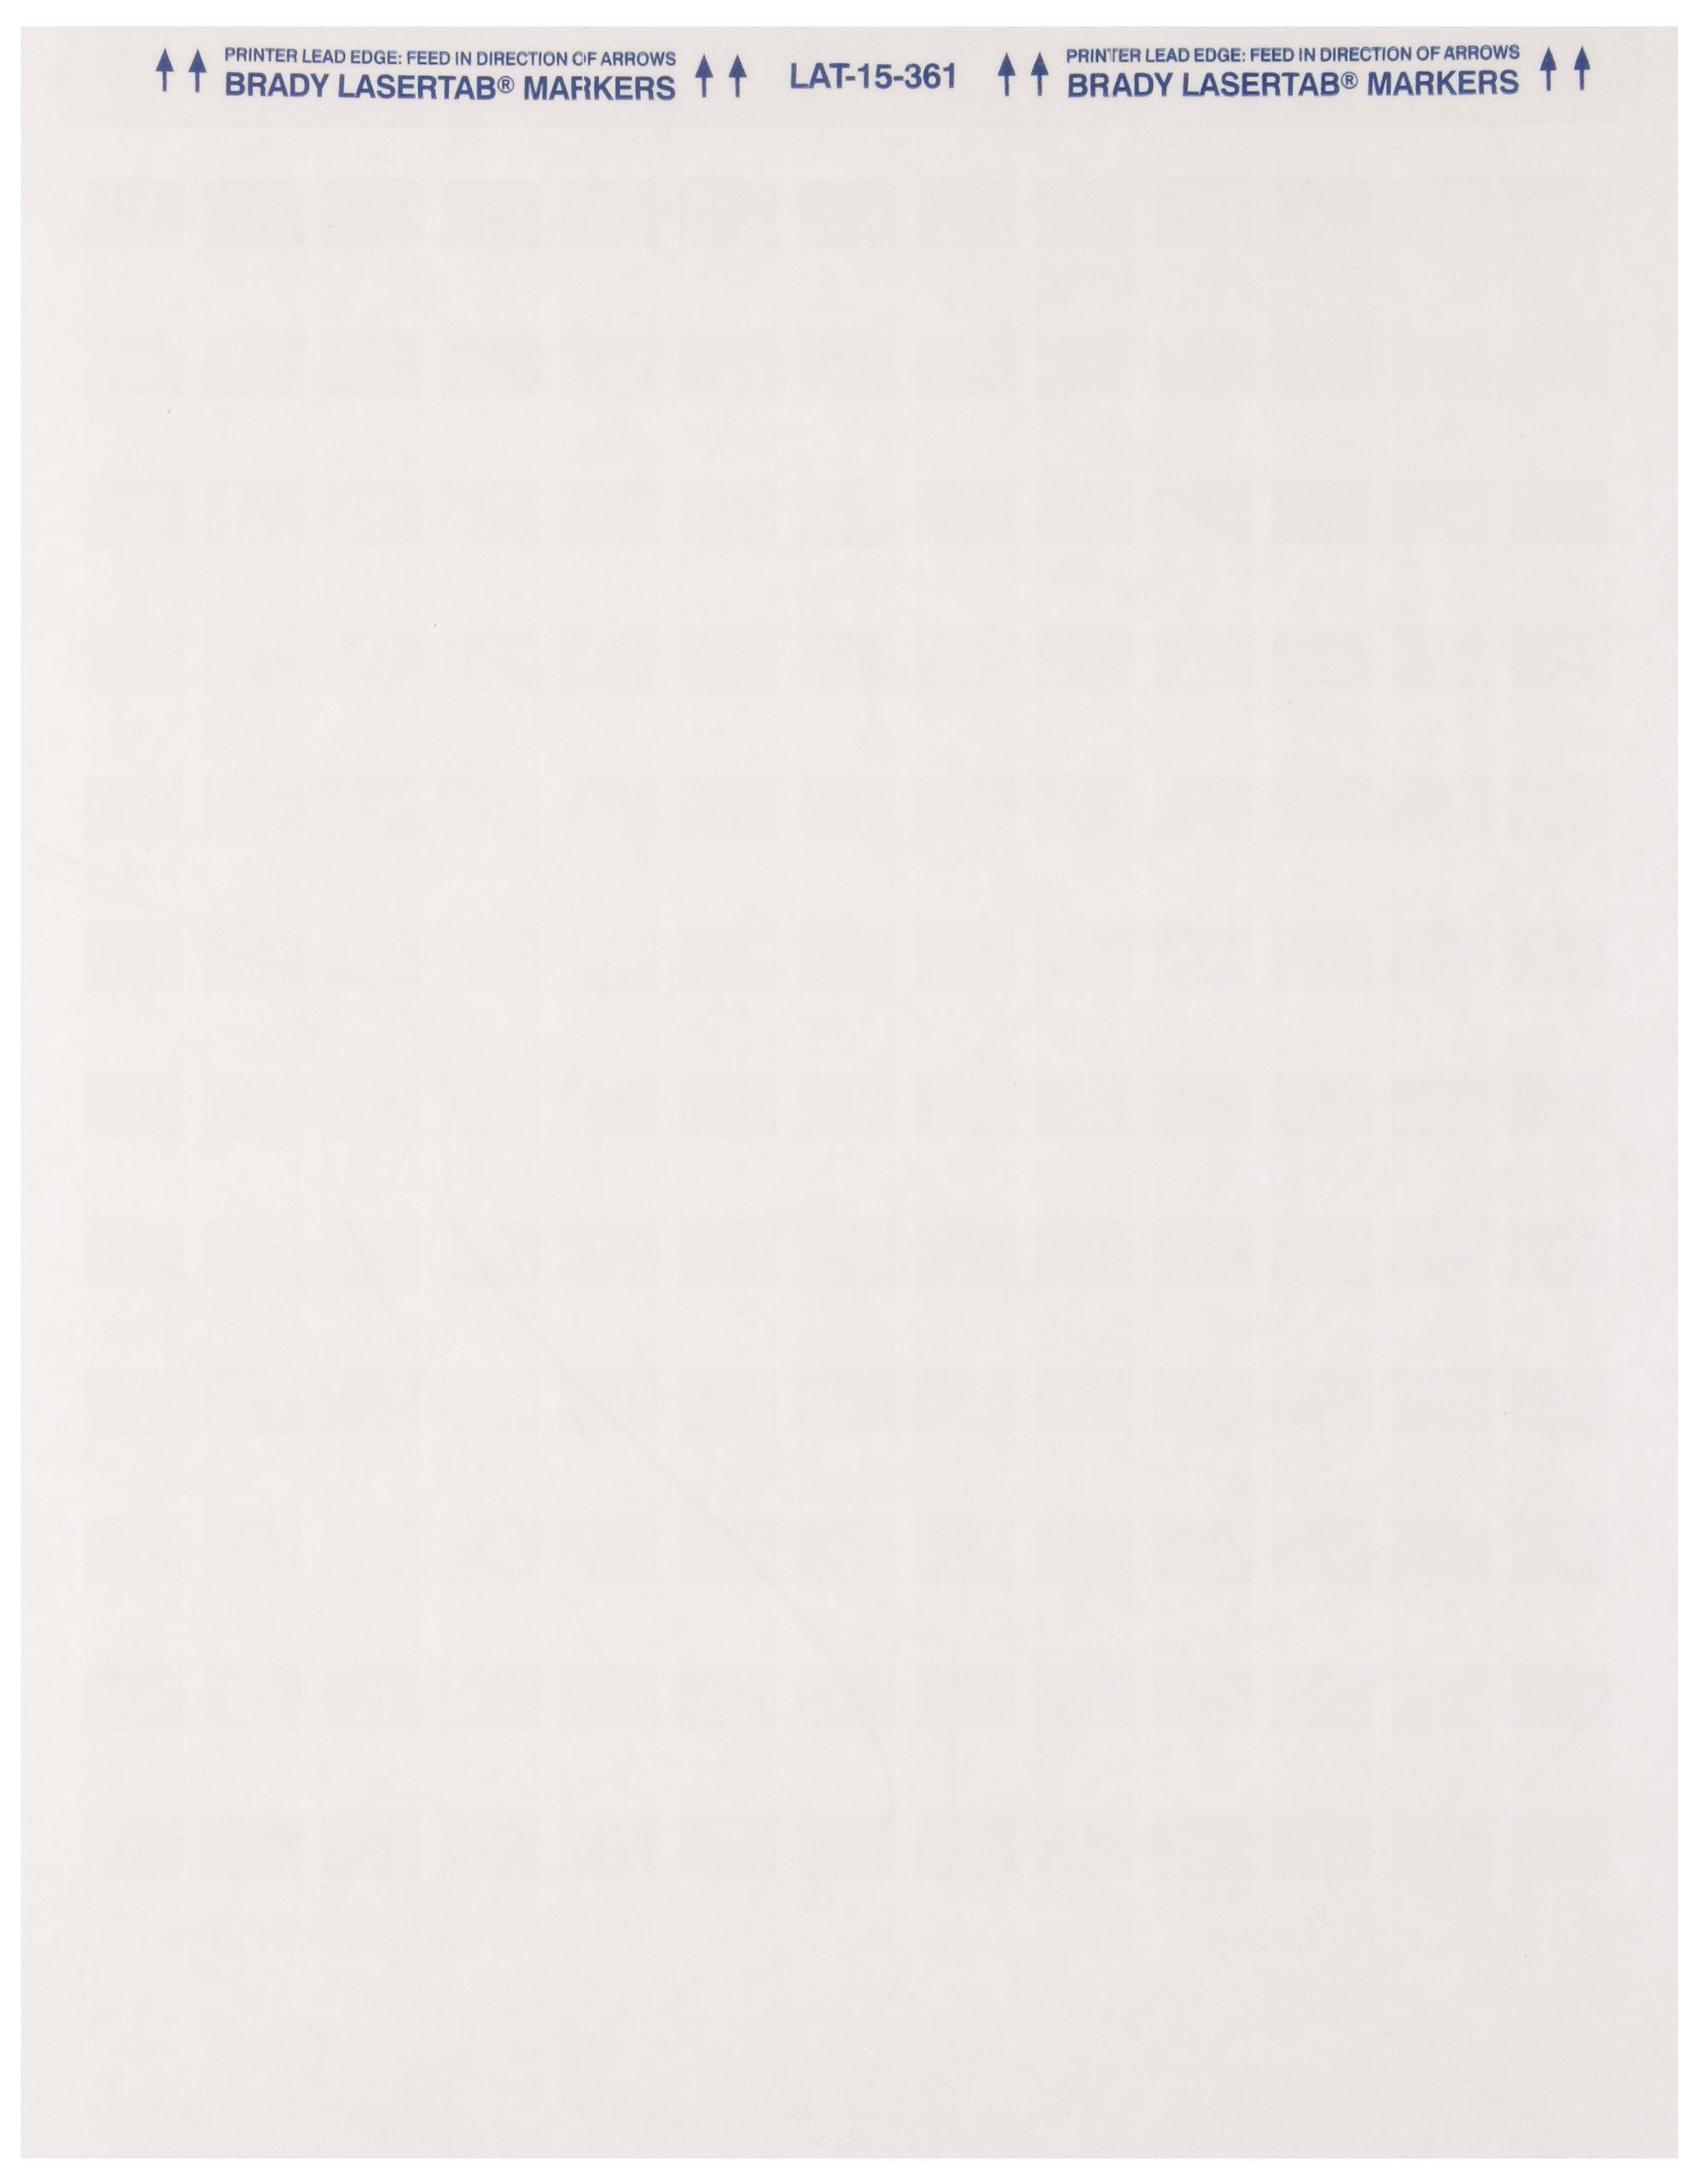 Brady LAT-15-361-1 0.5'' Width x 0.75'' Height, B-361B Self-Laminating Polyester, Matte Finish White/Translucent Laser Printable Label (Pack of 1000)